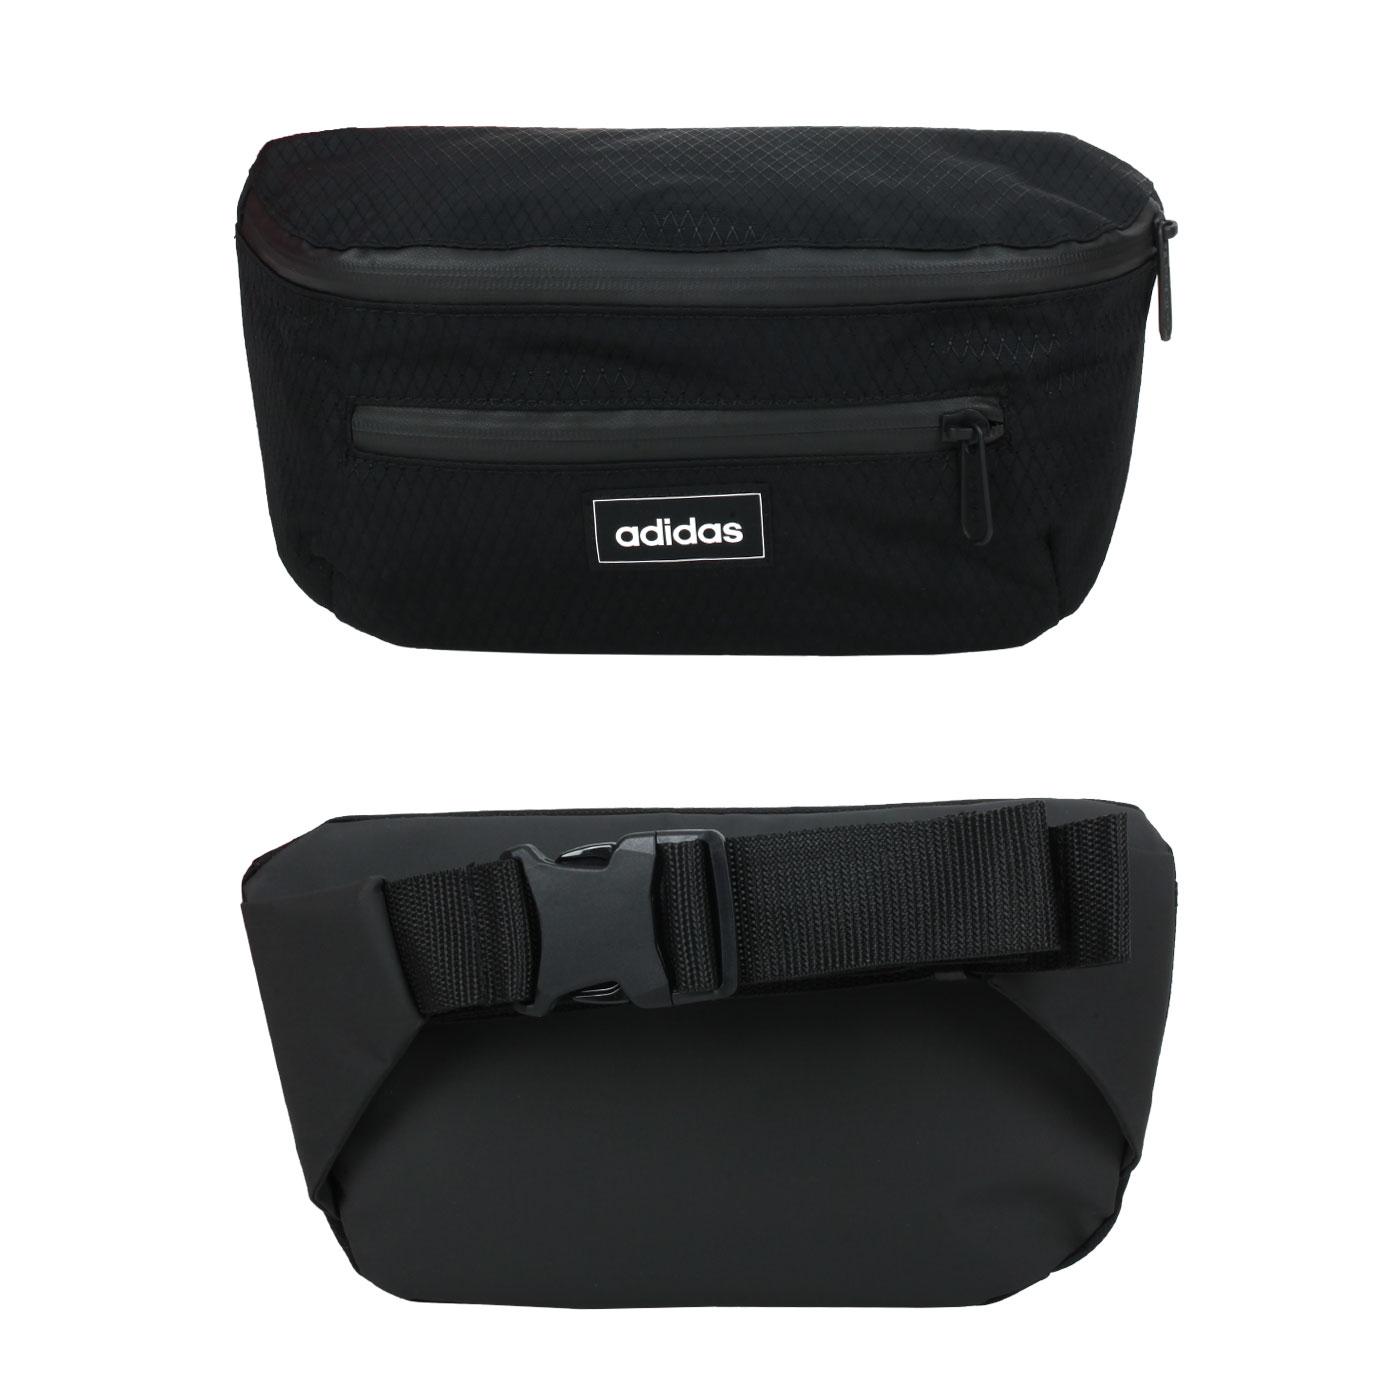 ADIDAS 小型腰包 GN2051